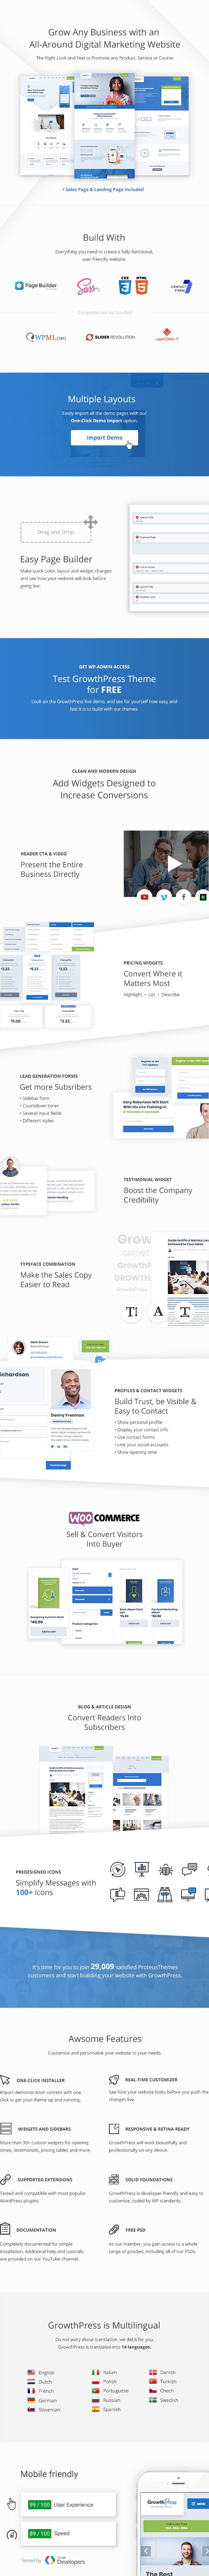 growthpress - marketing and seo wordpress theme (marketing) GrowthPress – Marketing and SEO WordPress Theme (Marketing) growth tf item page